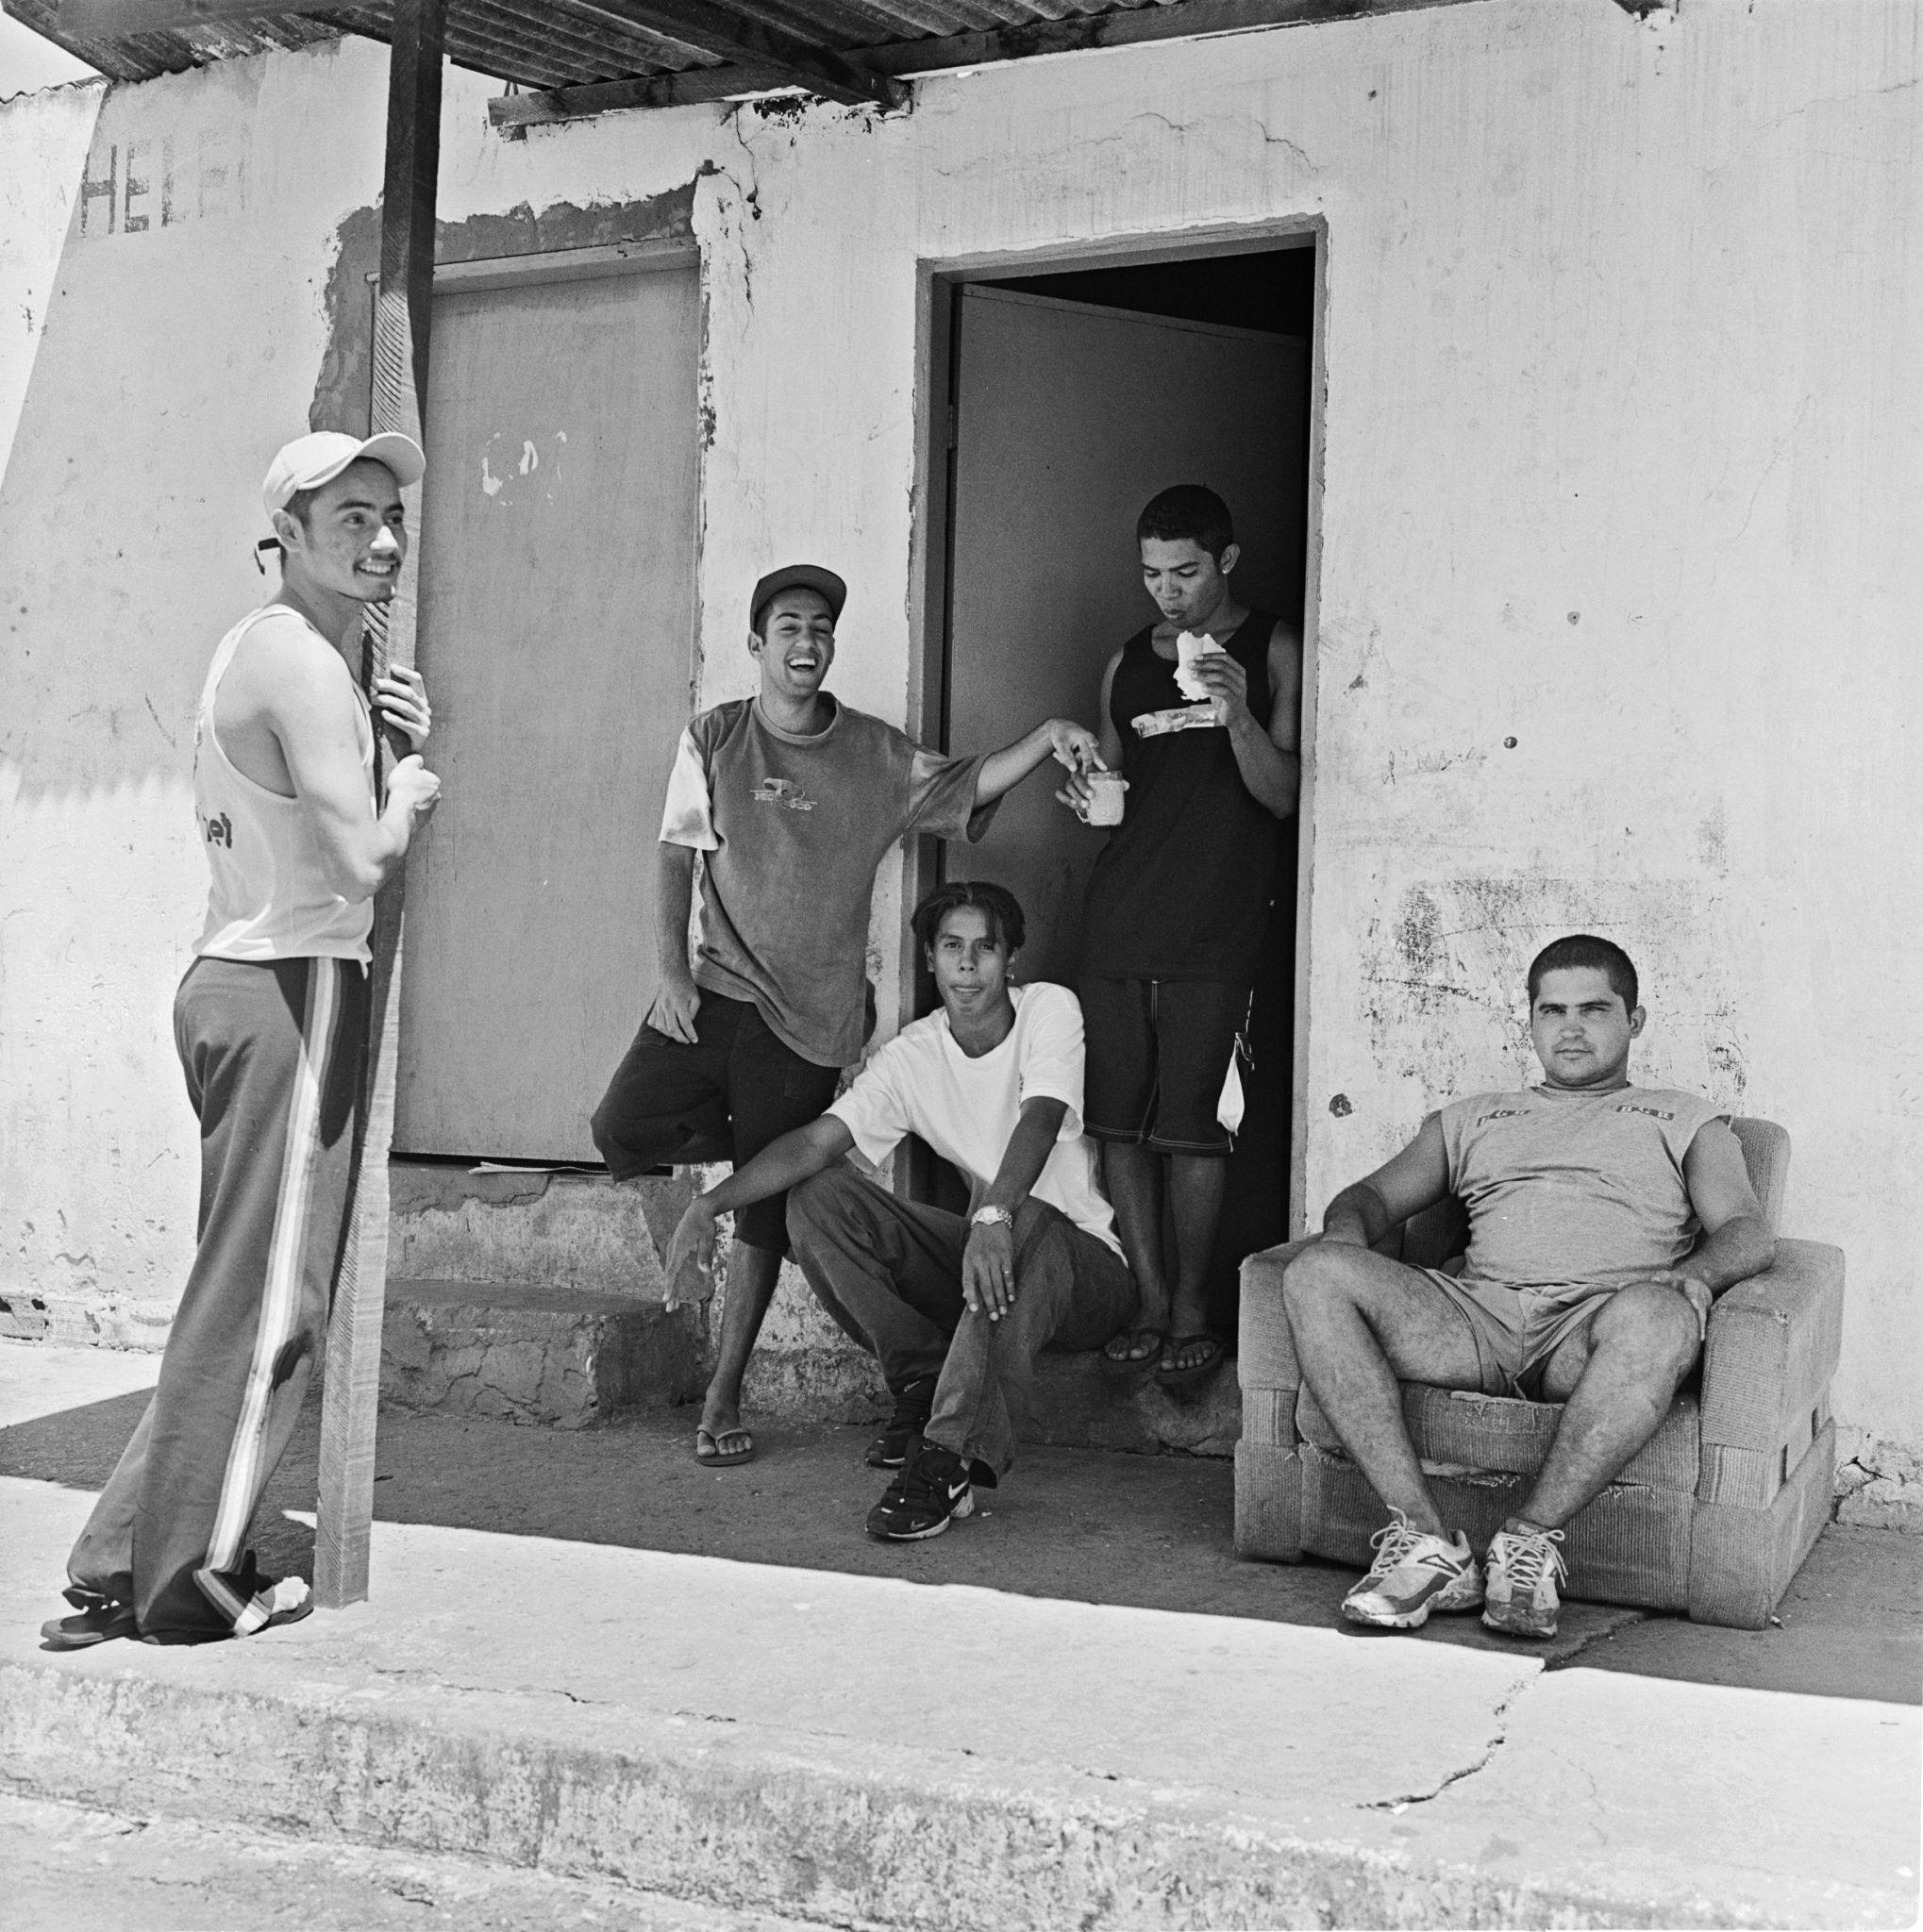 Jovens da periferia de Brasília DF_abril 2000